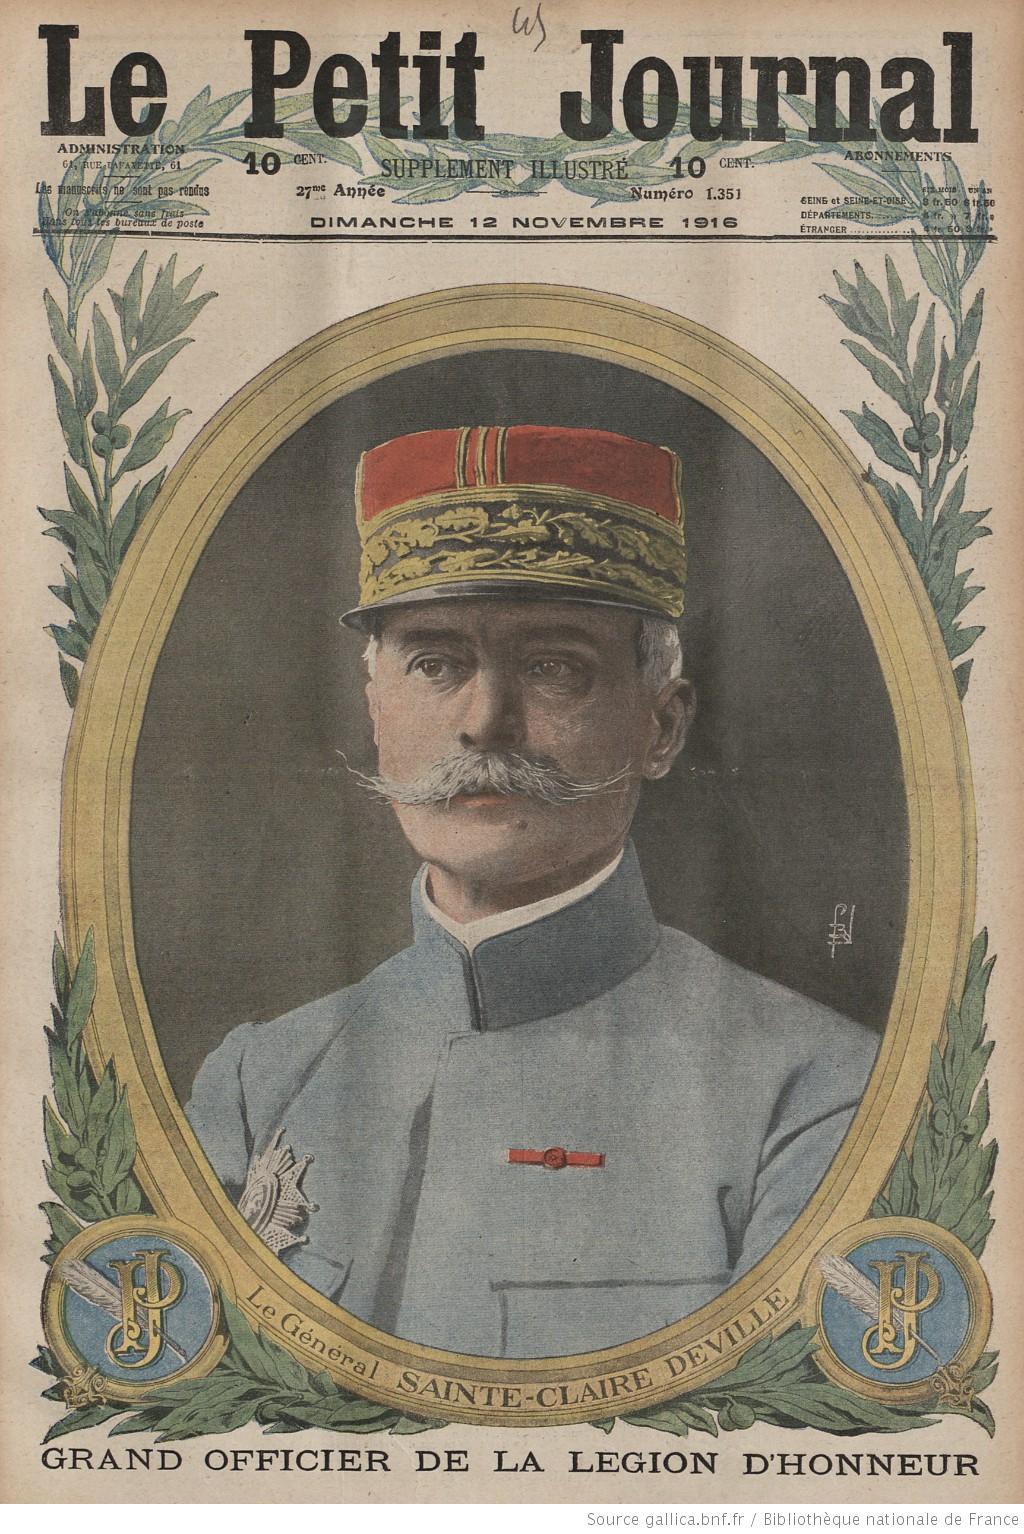 LPJ Illustre 1916-11-12 A.jpg